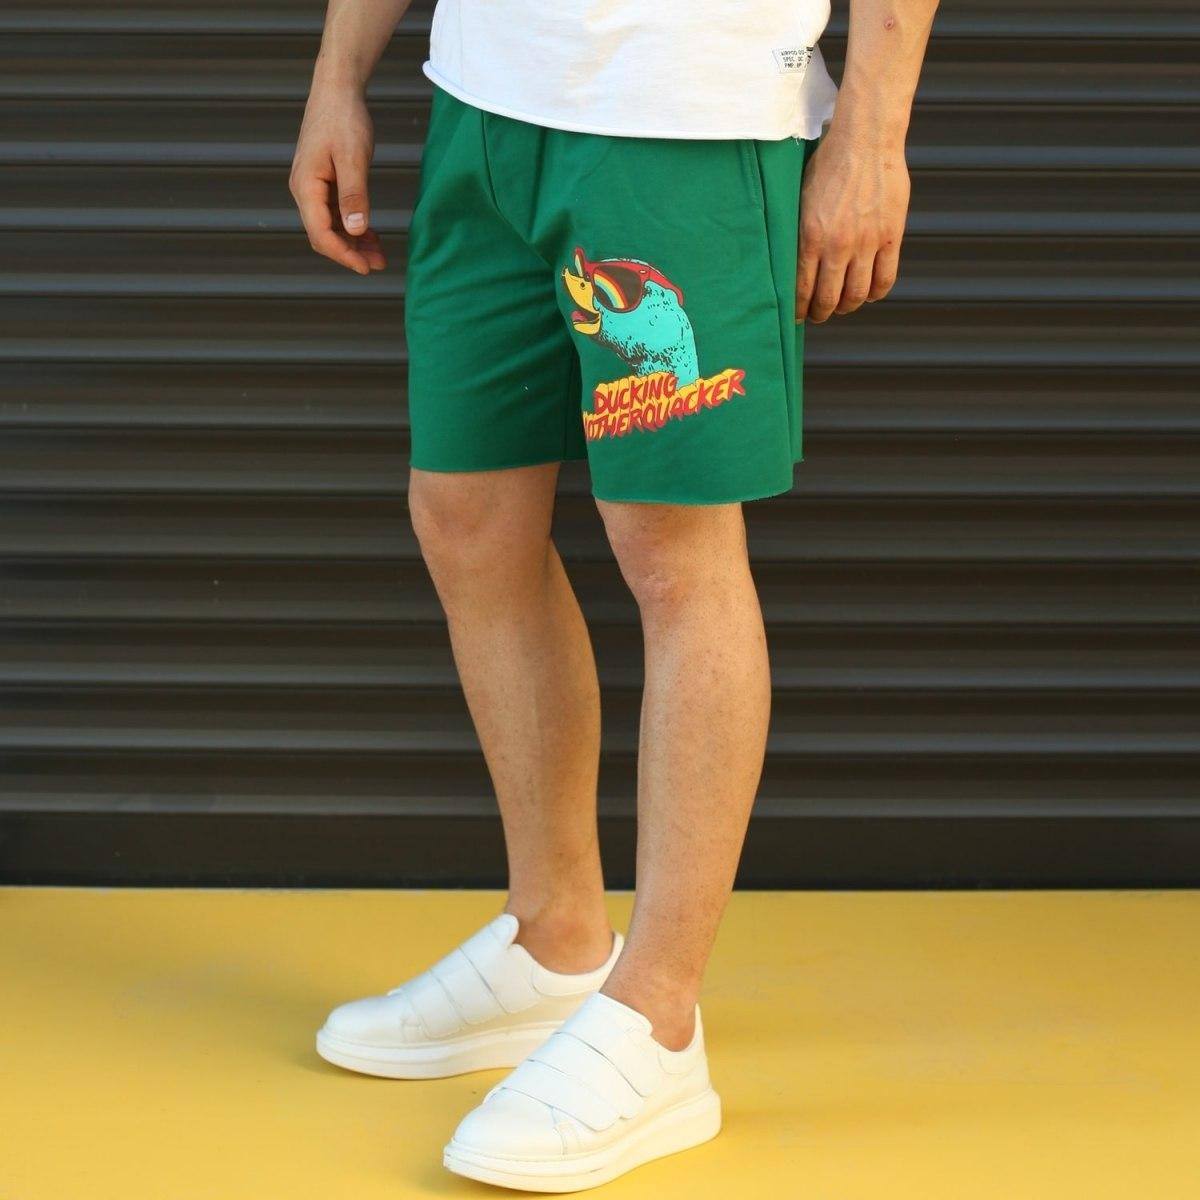 Men's Ducking Motherquackers Fleece Sport Shorts Green Mv Premium Brand - 3